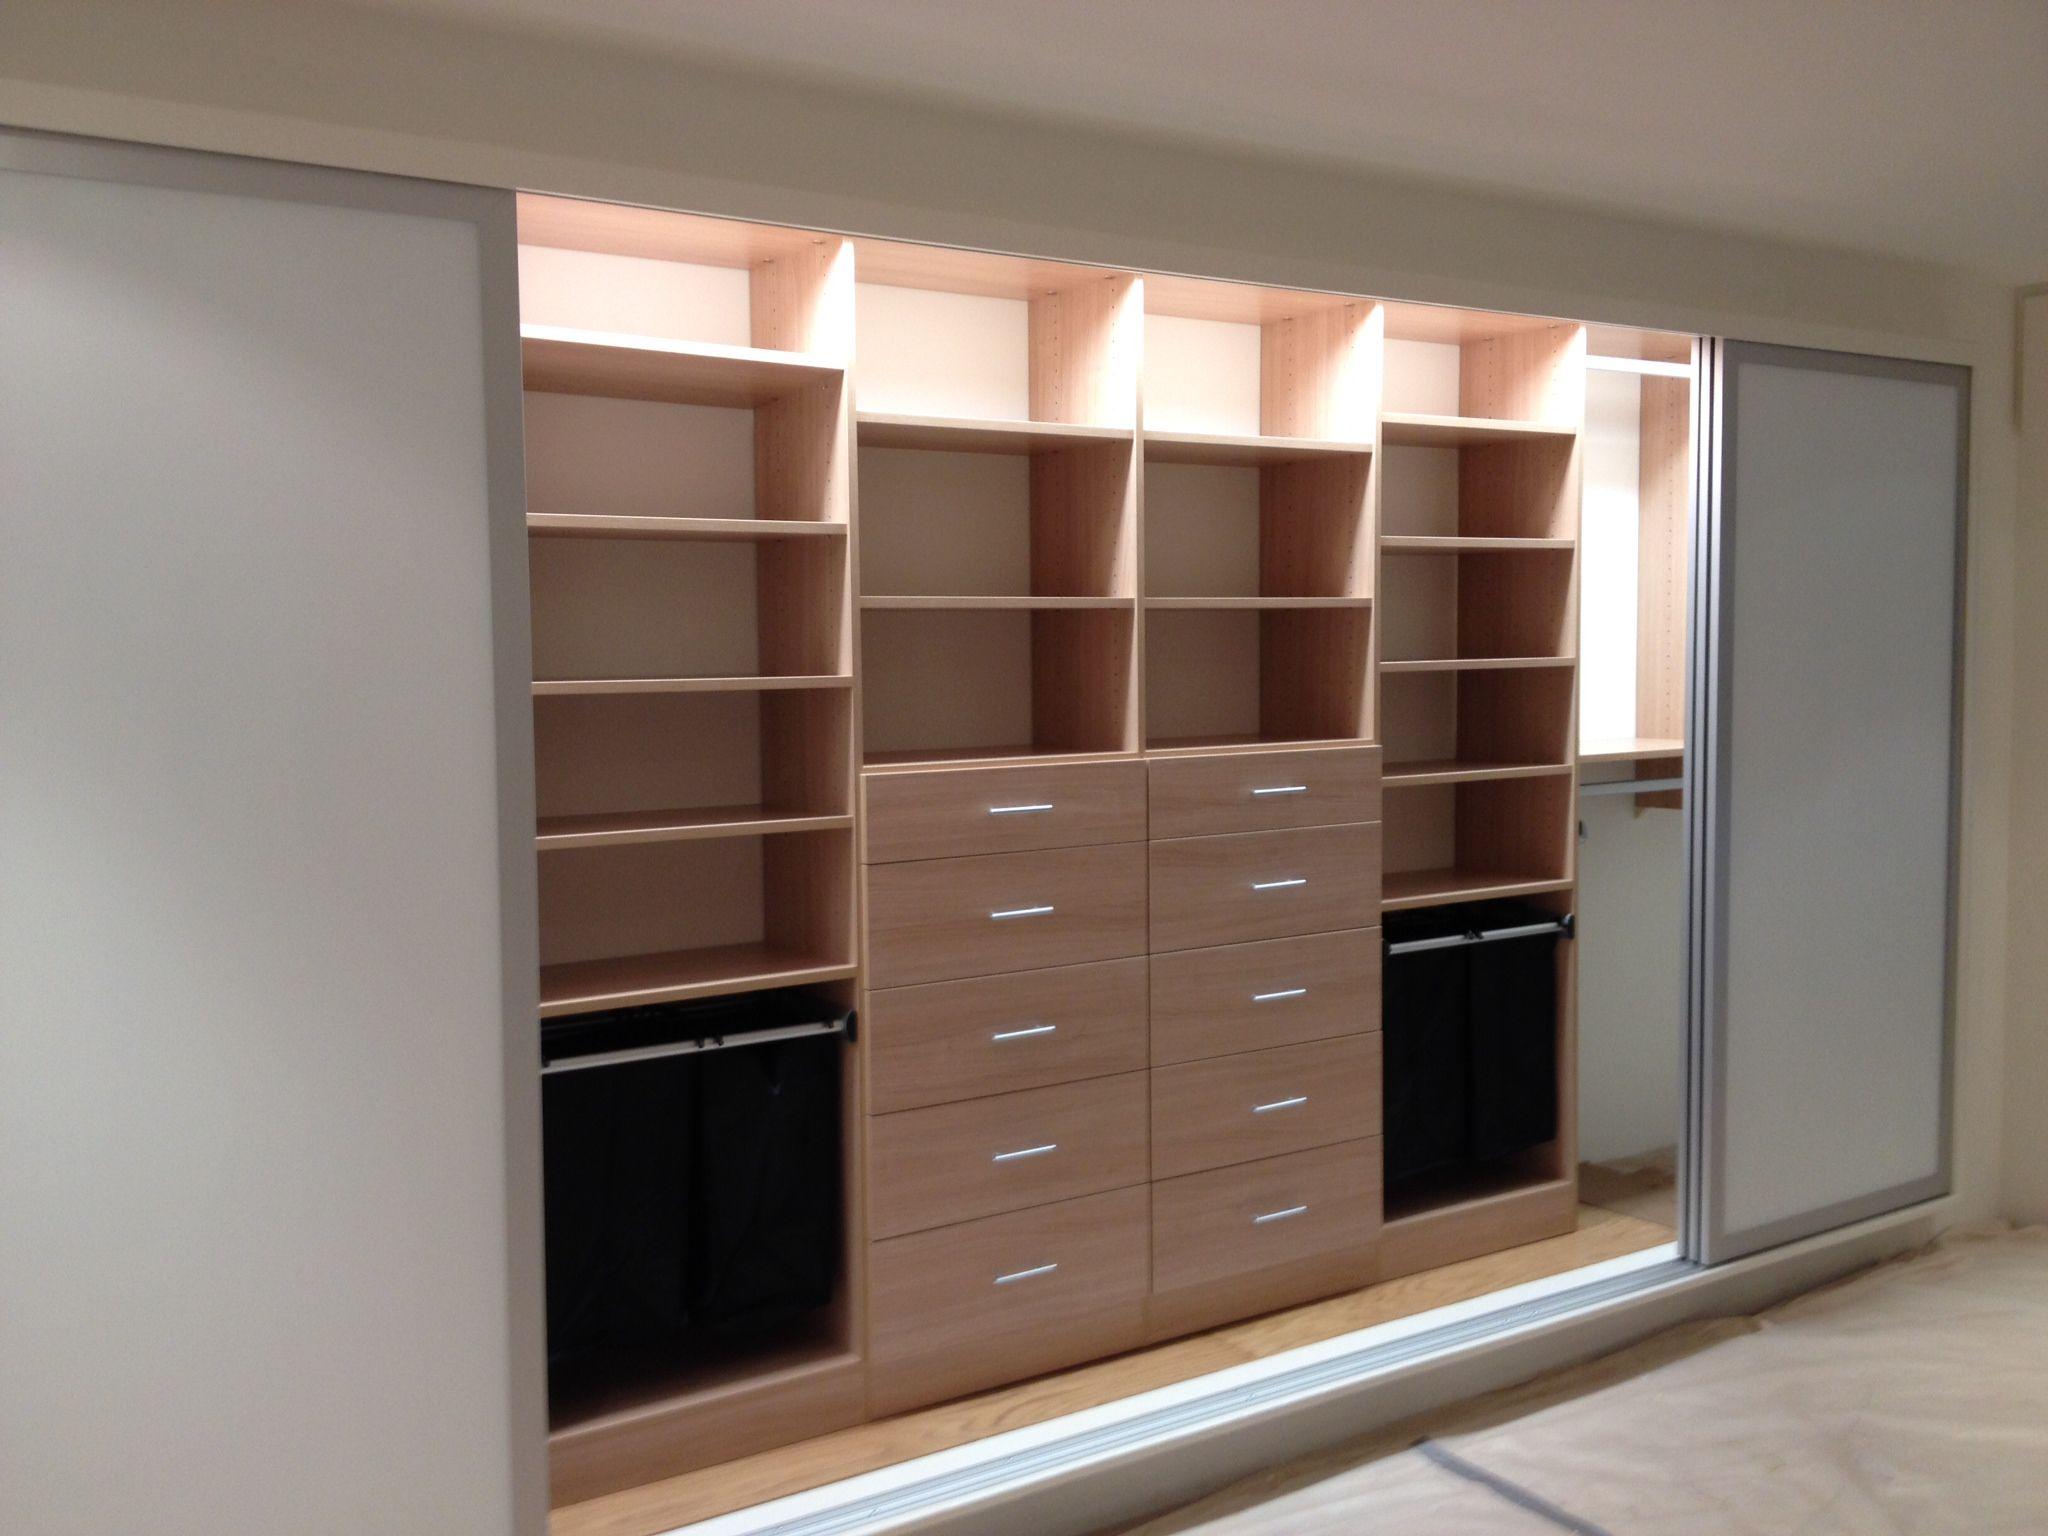 reach in closet sliding doors. Designer Ashly, California Closets Pittsburgh - Reach In Closet, Umbrian Oak \u0026 Element Sliding Closet Doors